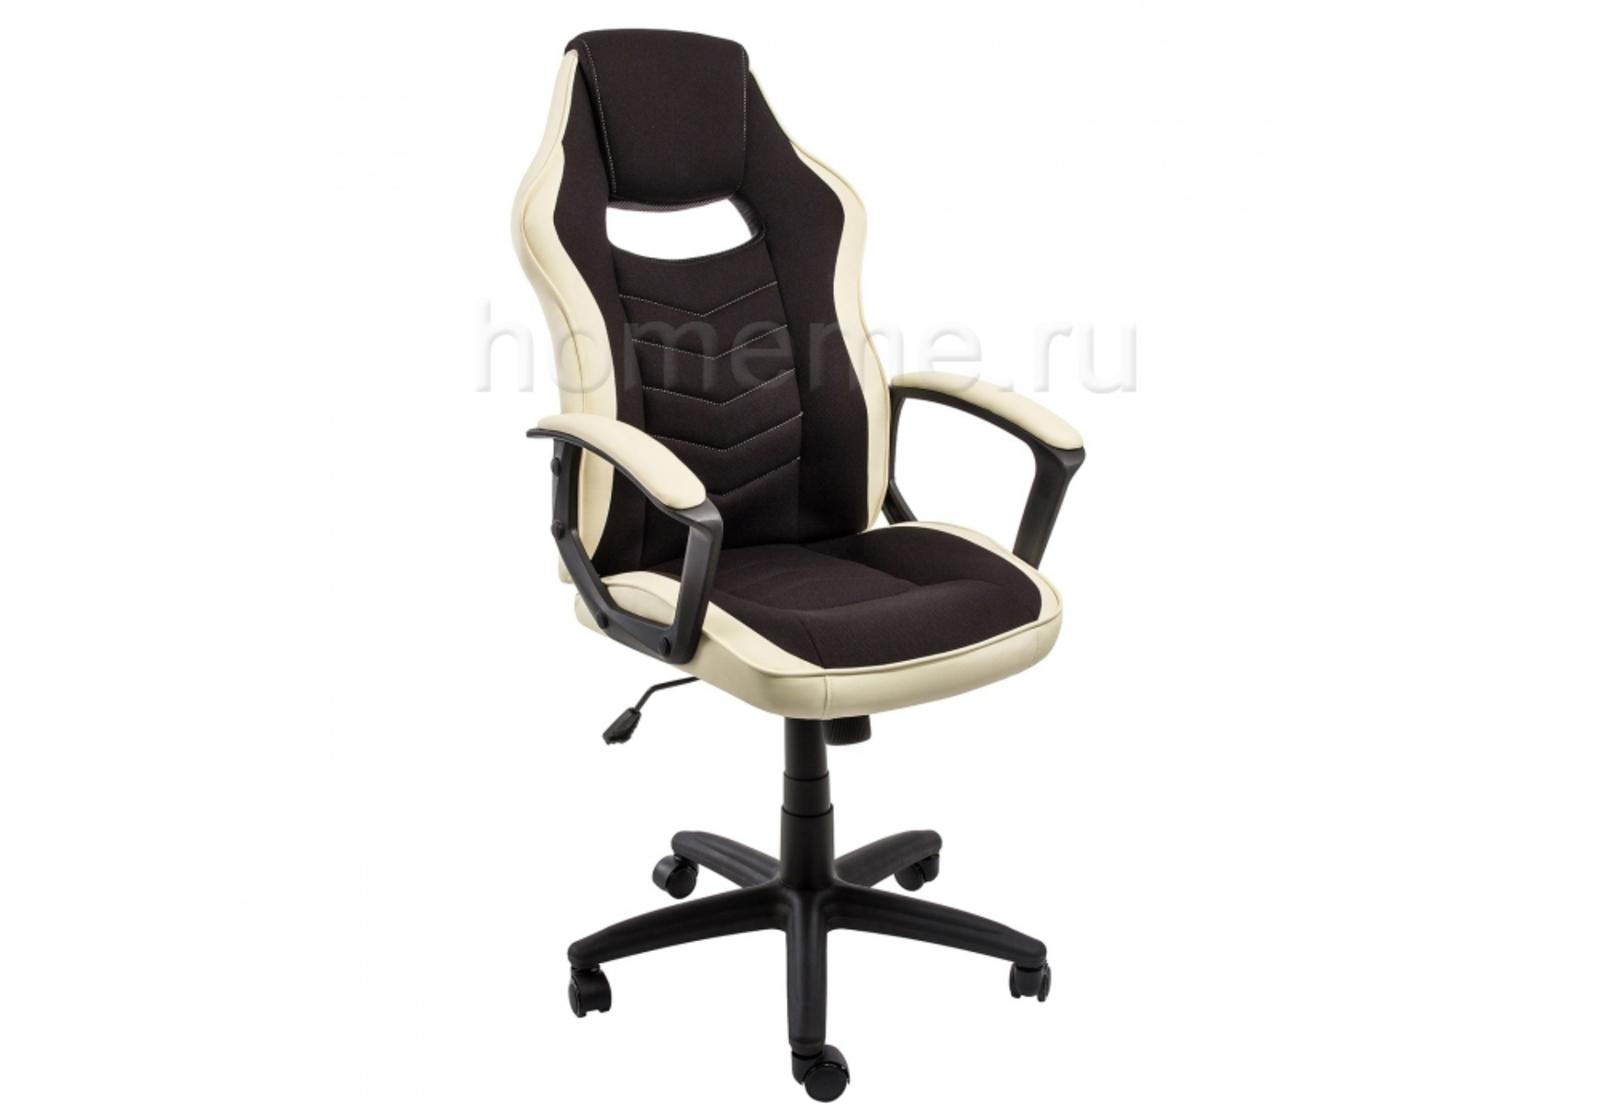 Кресло для офиса HomeMe Gamer черное / бежевое 1861 от Homeme.ru